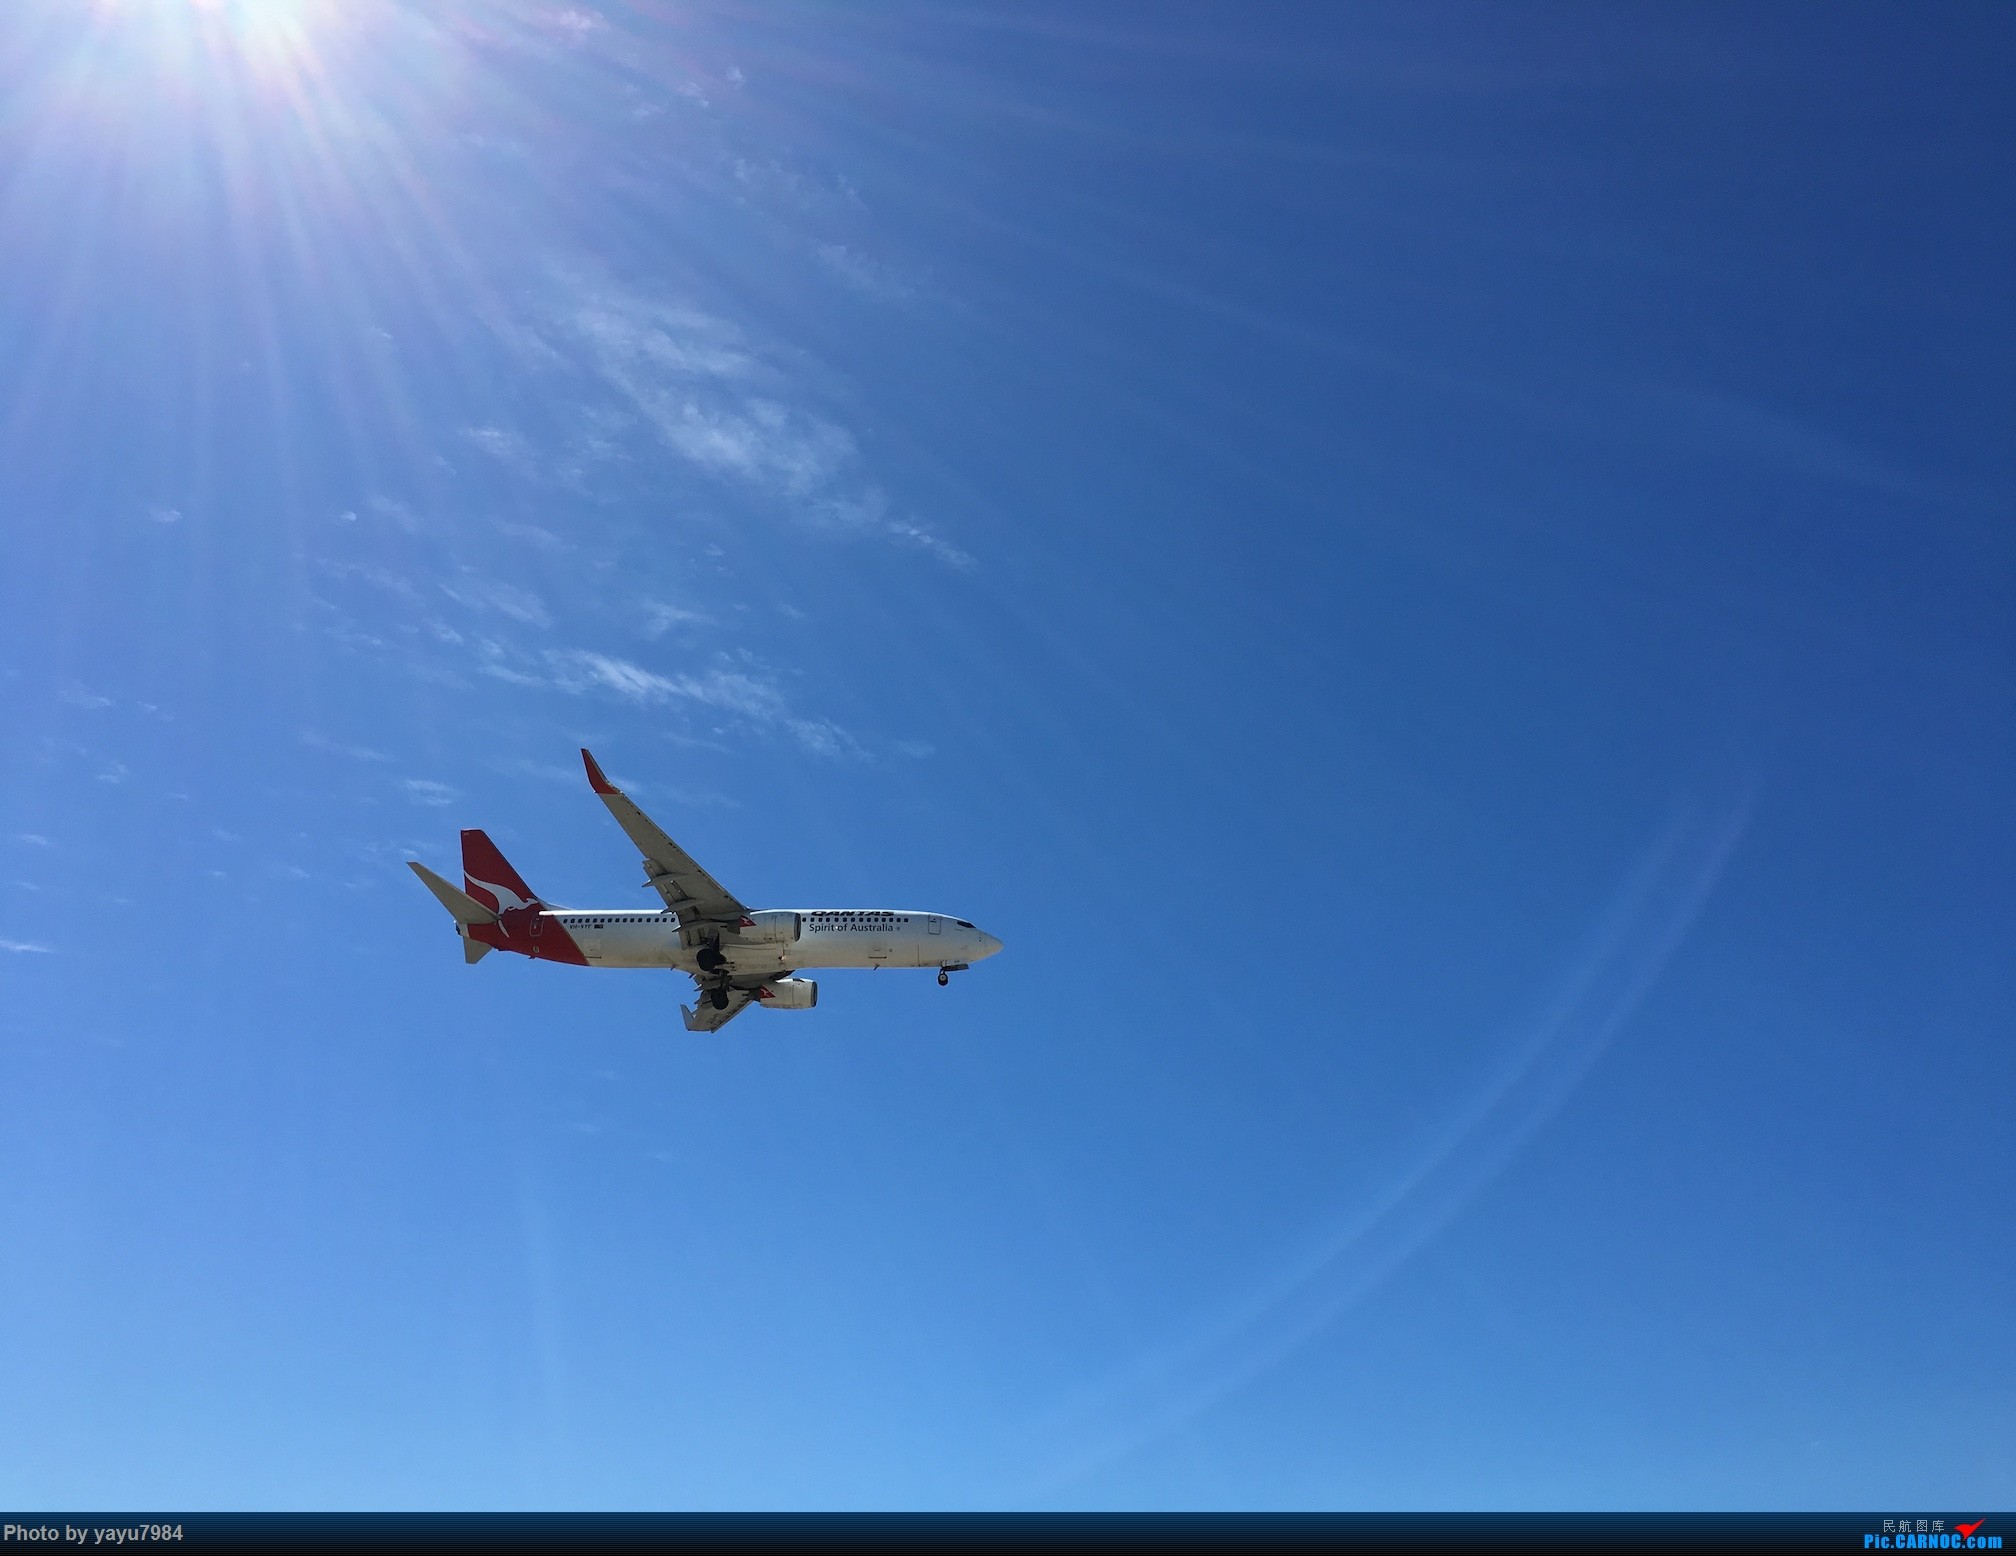 Re:[原创][SYD] 久违的南向起降,纪录16R拍机之行 BOEING 737-800 VH-VYF 澳大利亚悉尼金斯福德·史密斯机场